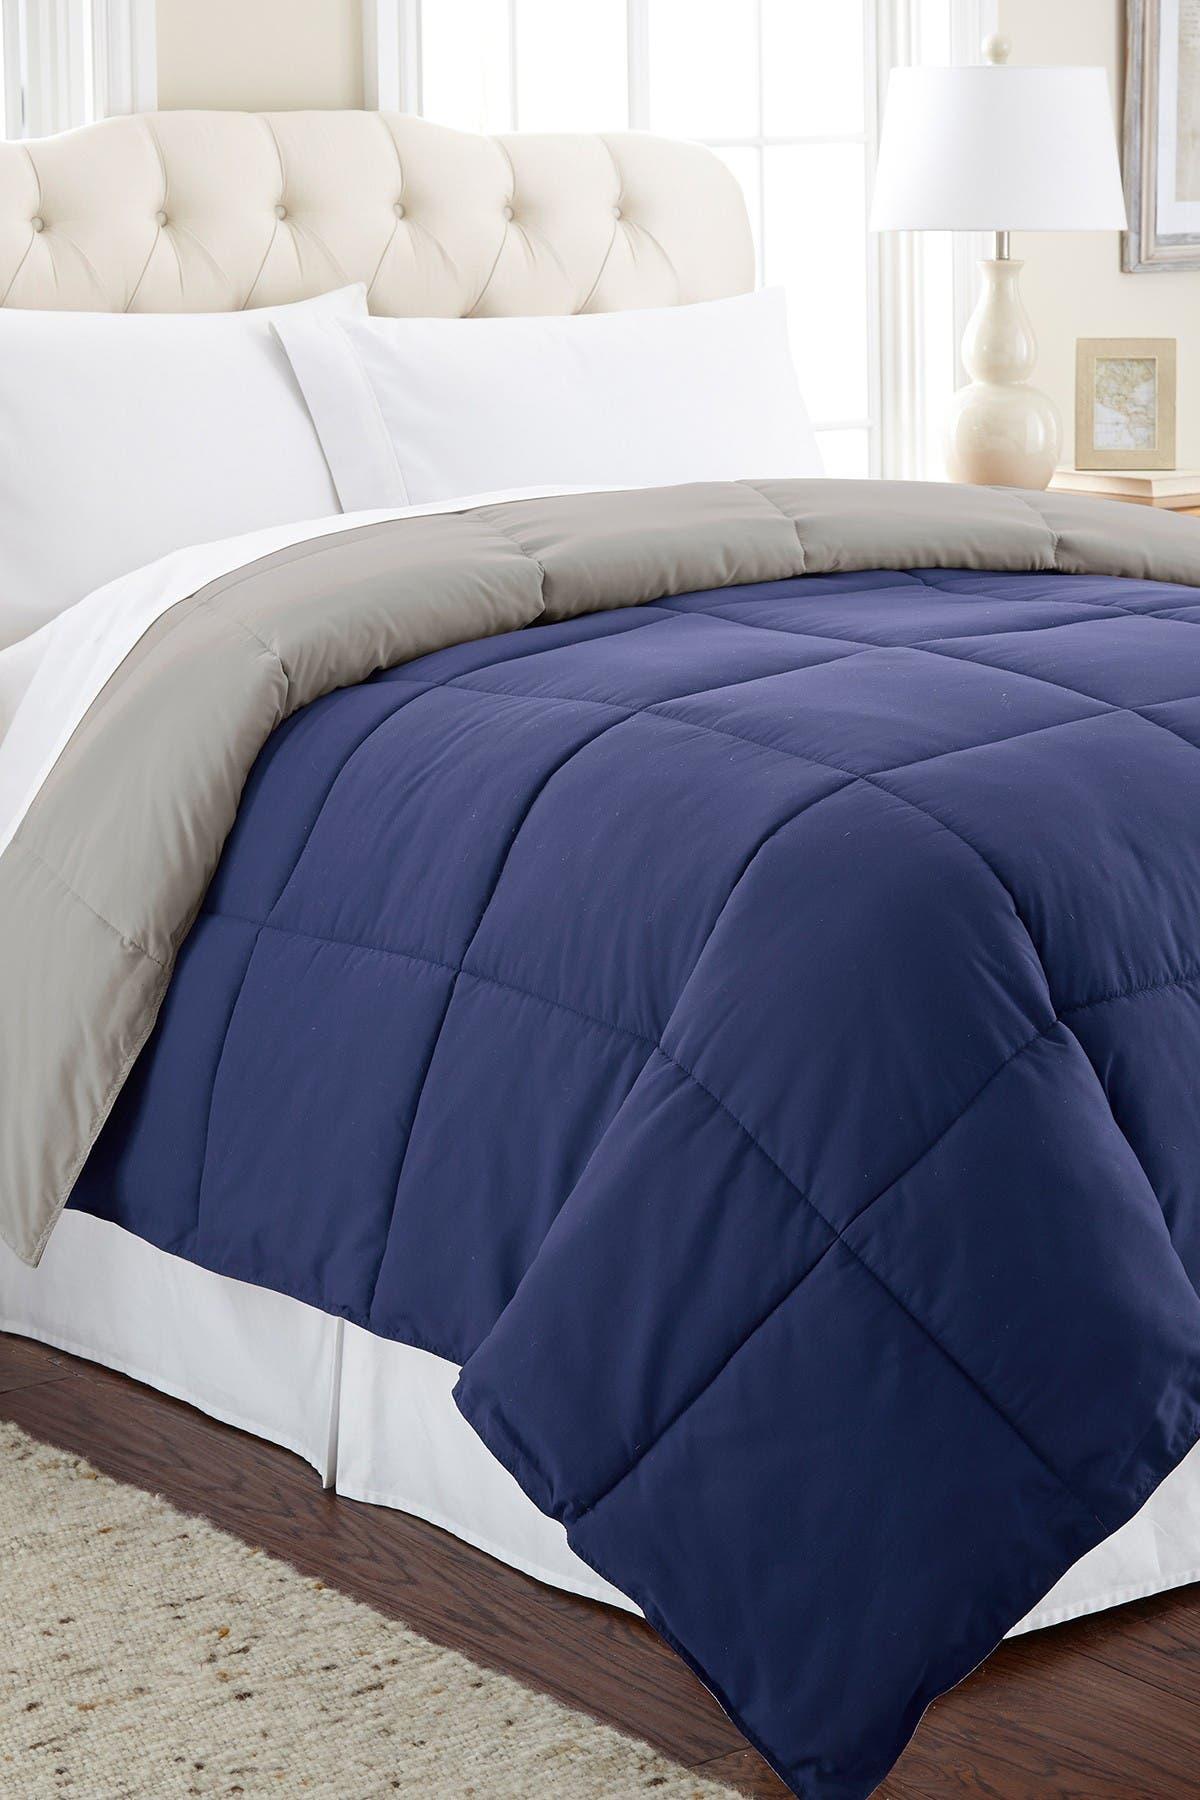 Image of Modern Threads Down Alternative Reversible Queen Comforter - Eclipse/Silver